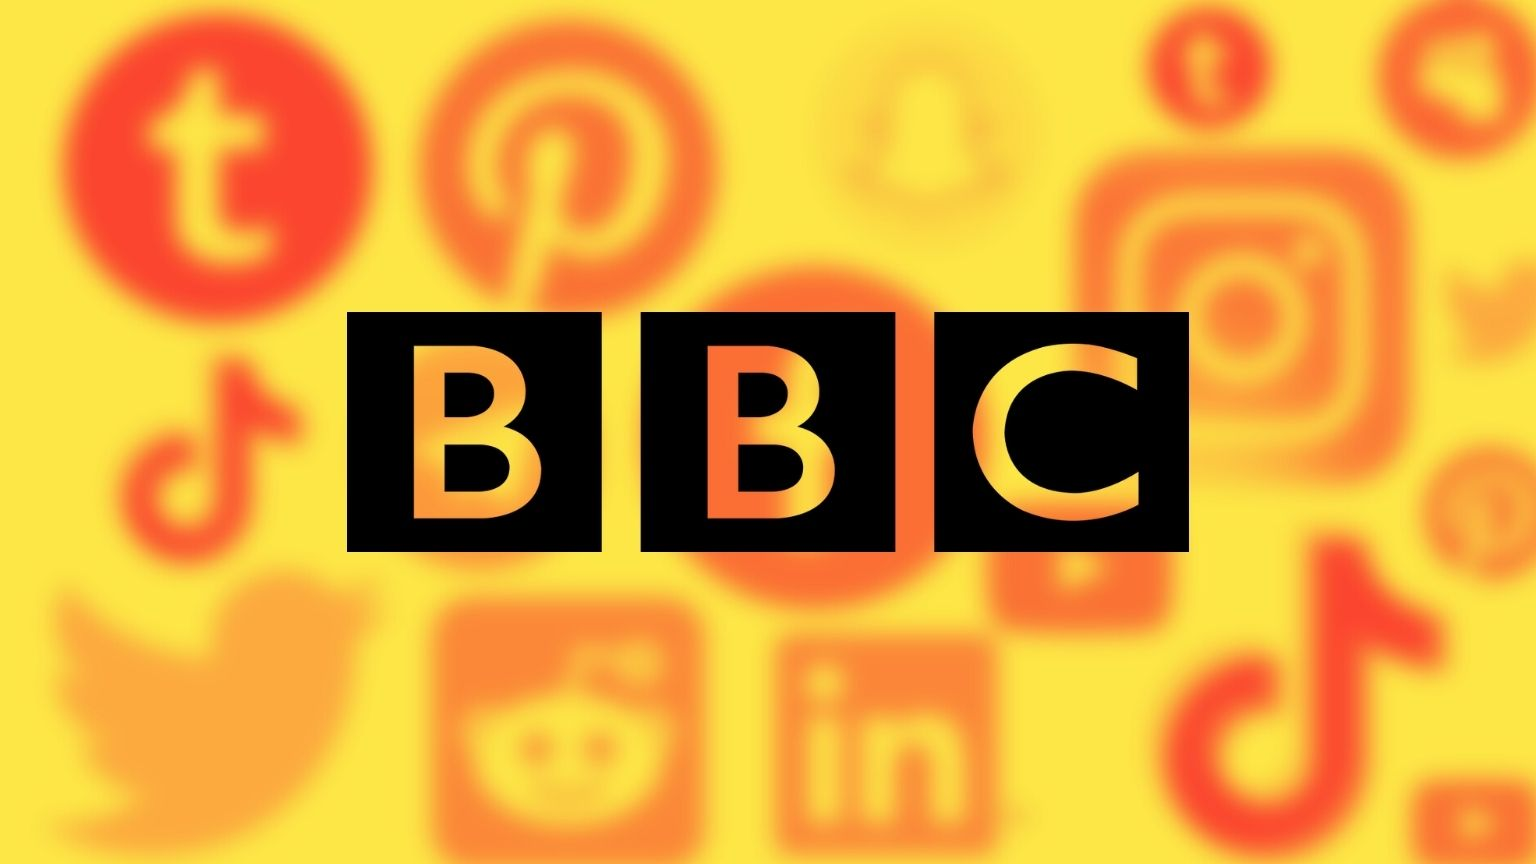 BBC chairman calls for crackdown on speech online